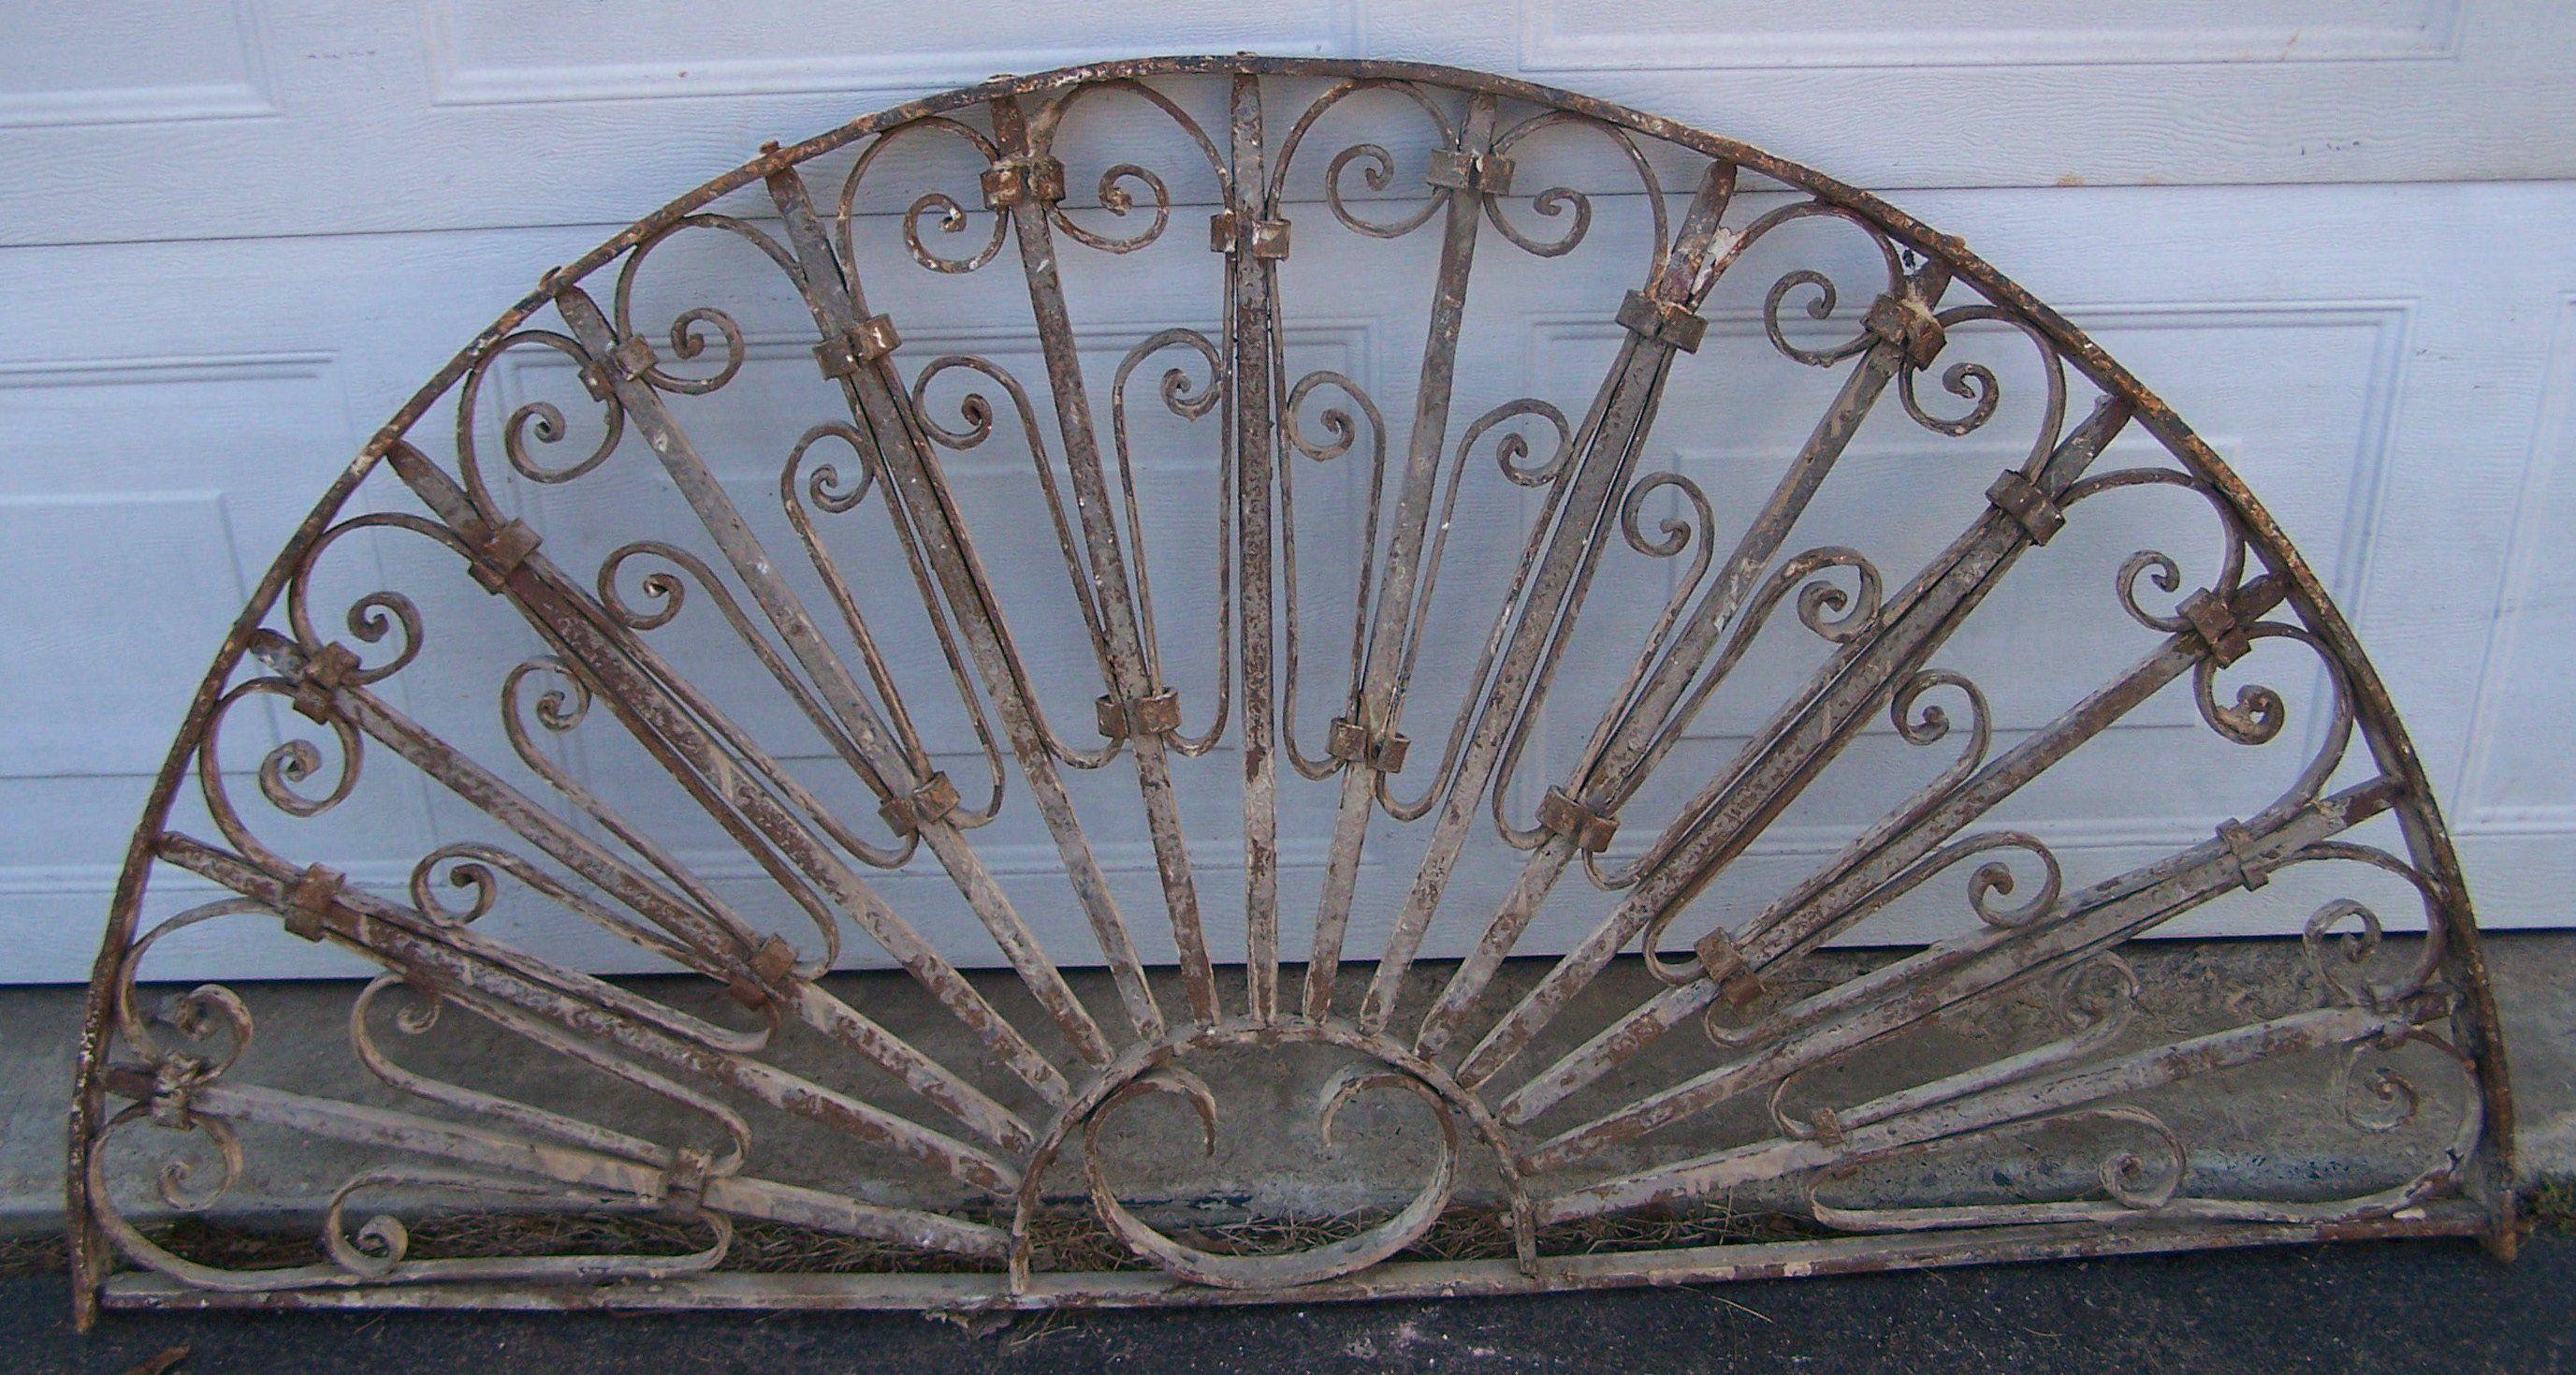 Antique Ornate Transom Iron Window Antique Iron Door Header Half Sash Transom Window Rustic Half Moon Mediterranean Iron Windo Iron Doors Antique Iron Antiques